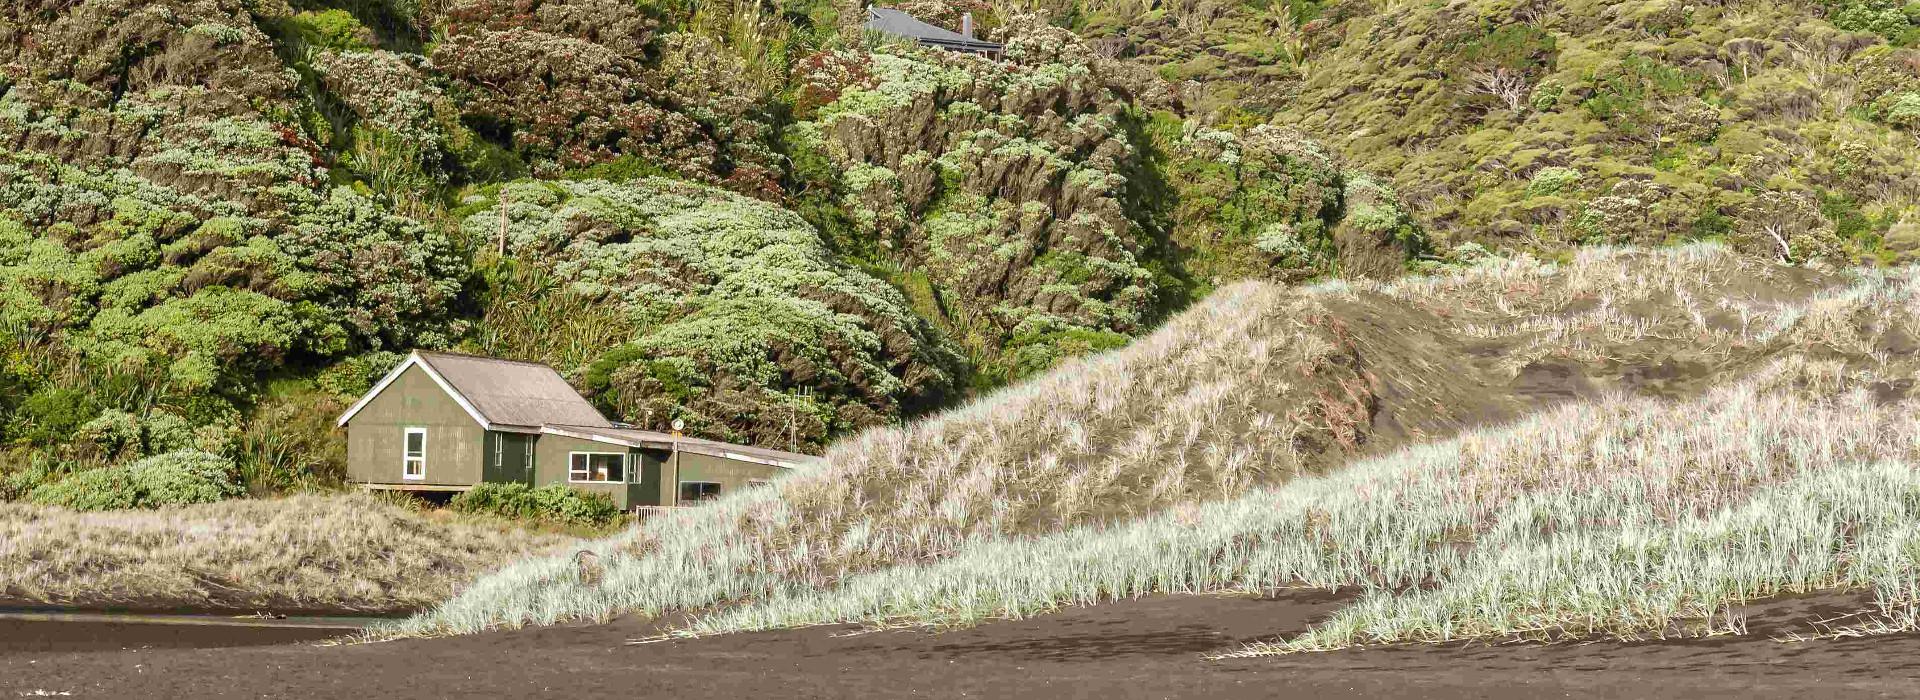 Waitakere Ranges near Karekare Beach, New Zealand